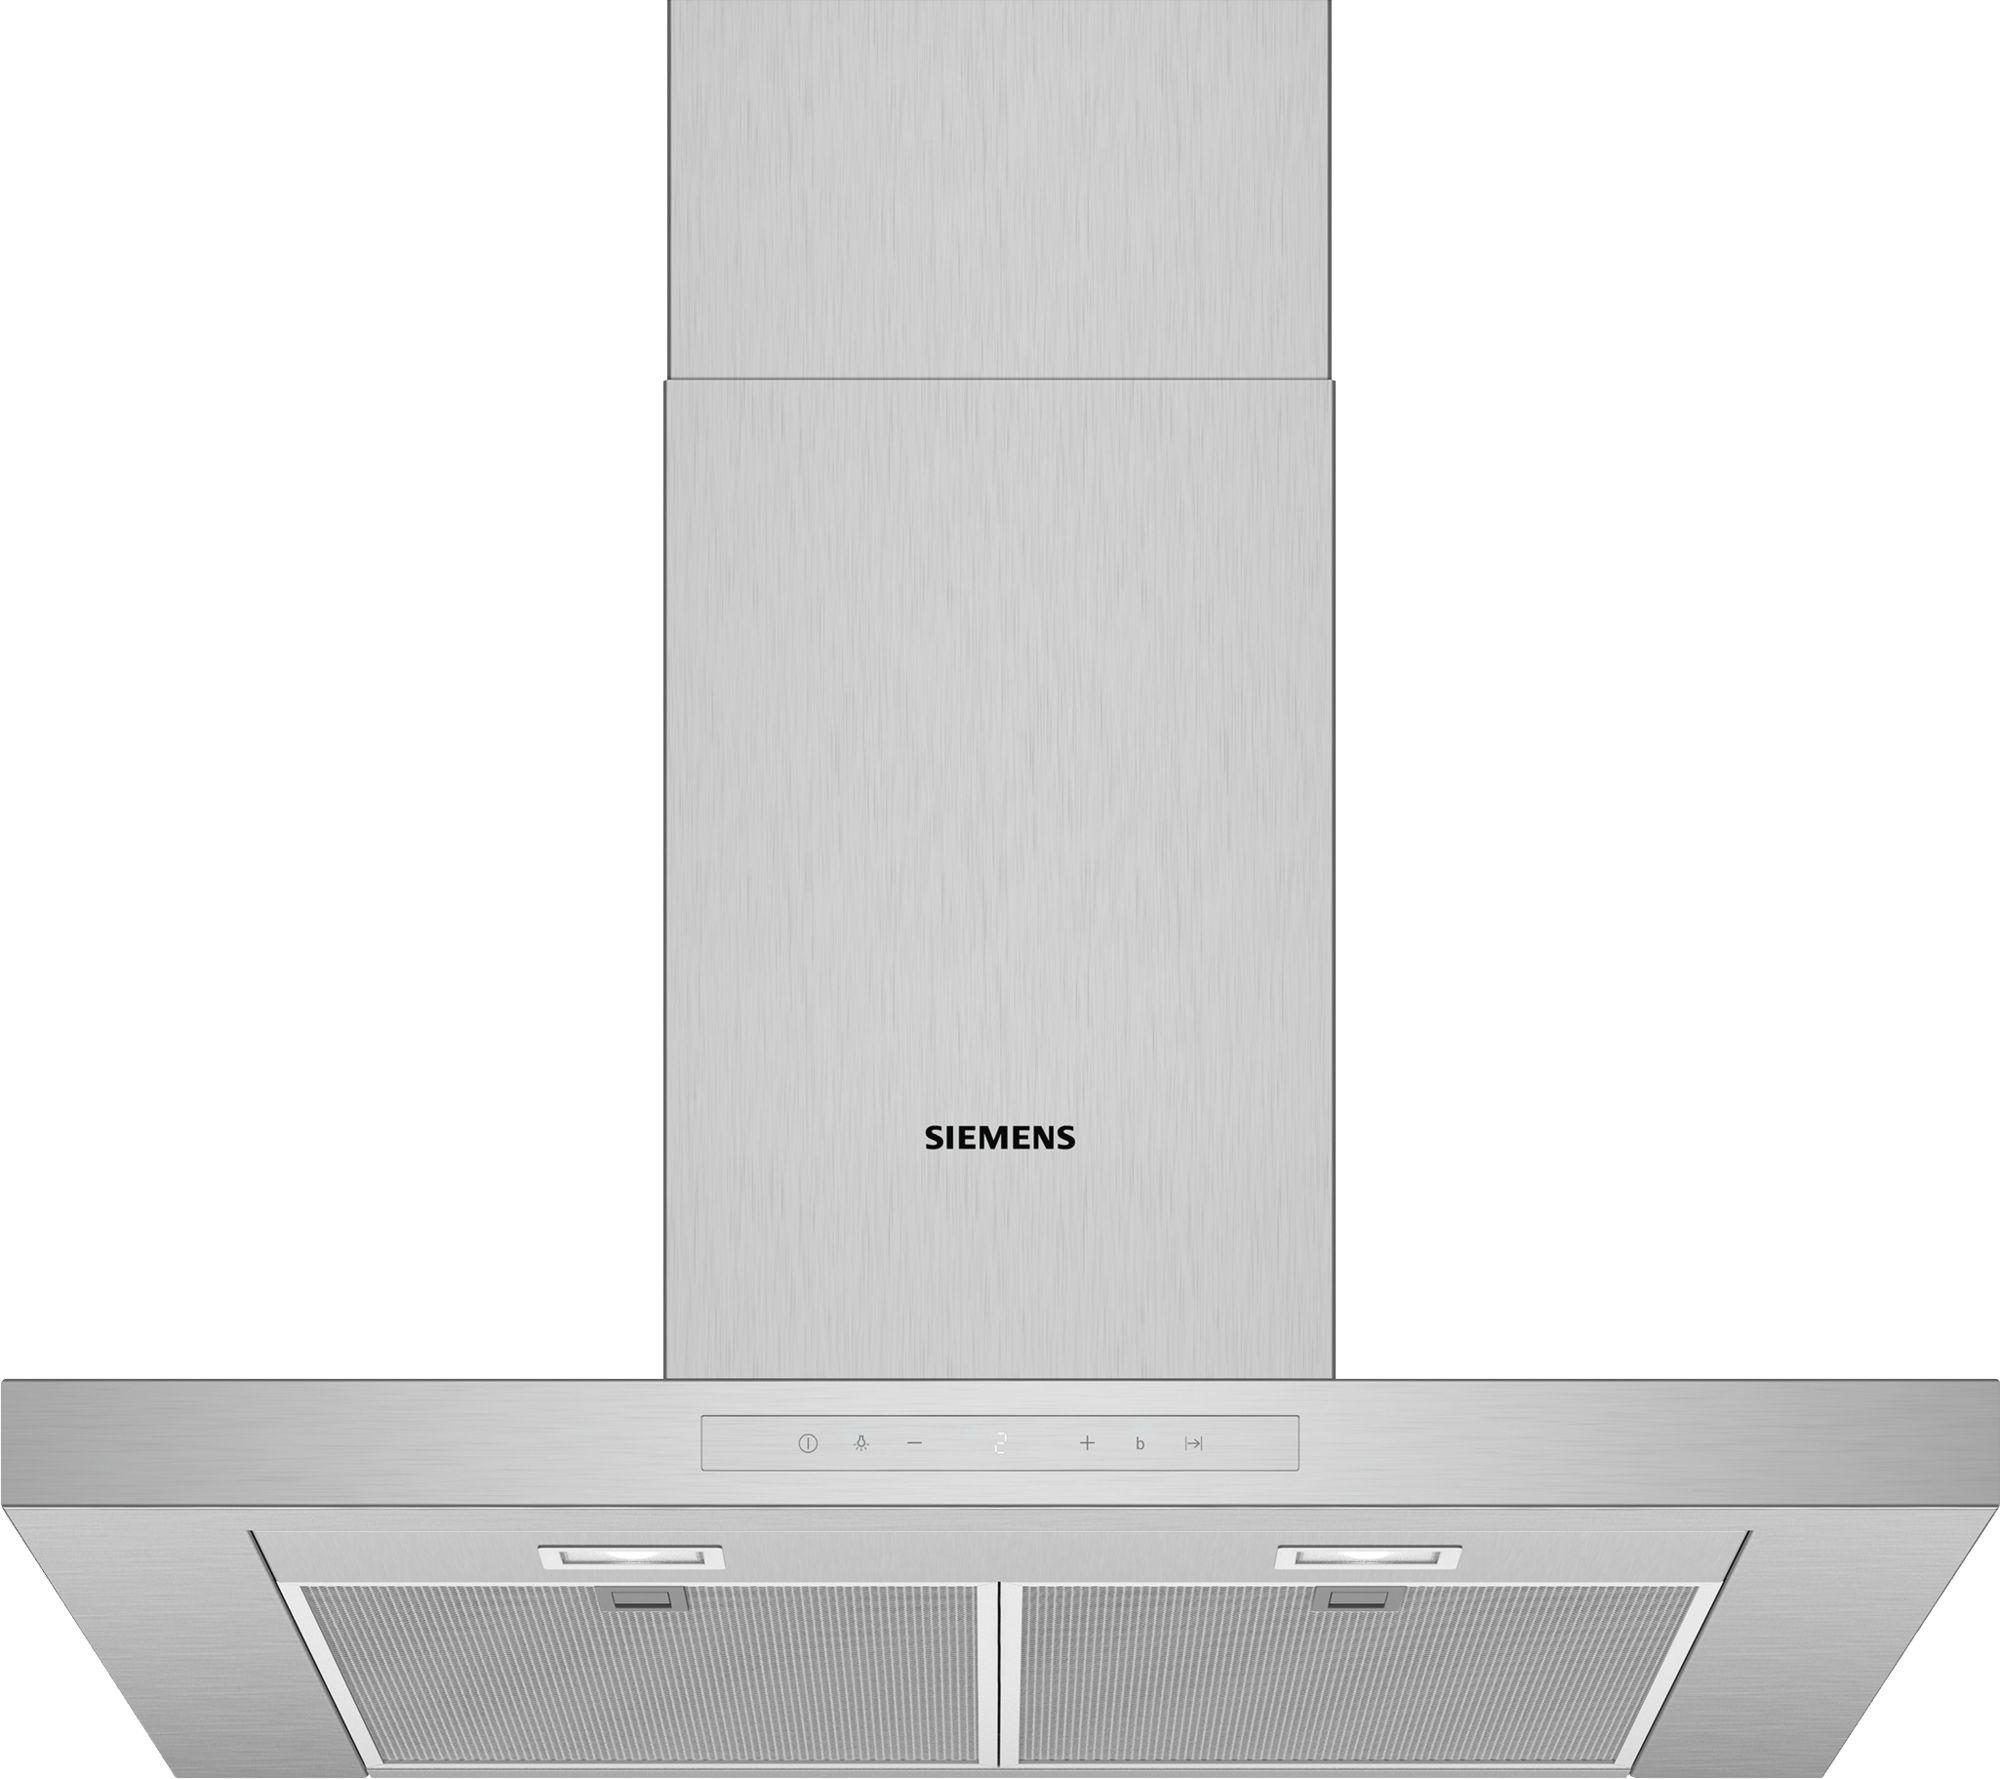 Siemens LC77BCP50 Schouwkap Aluminium